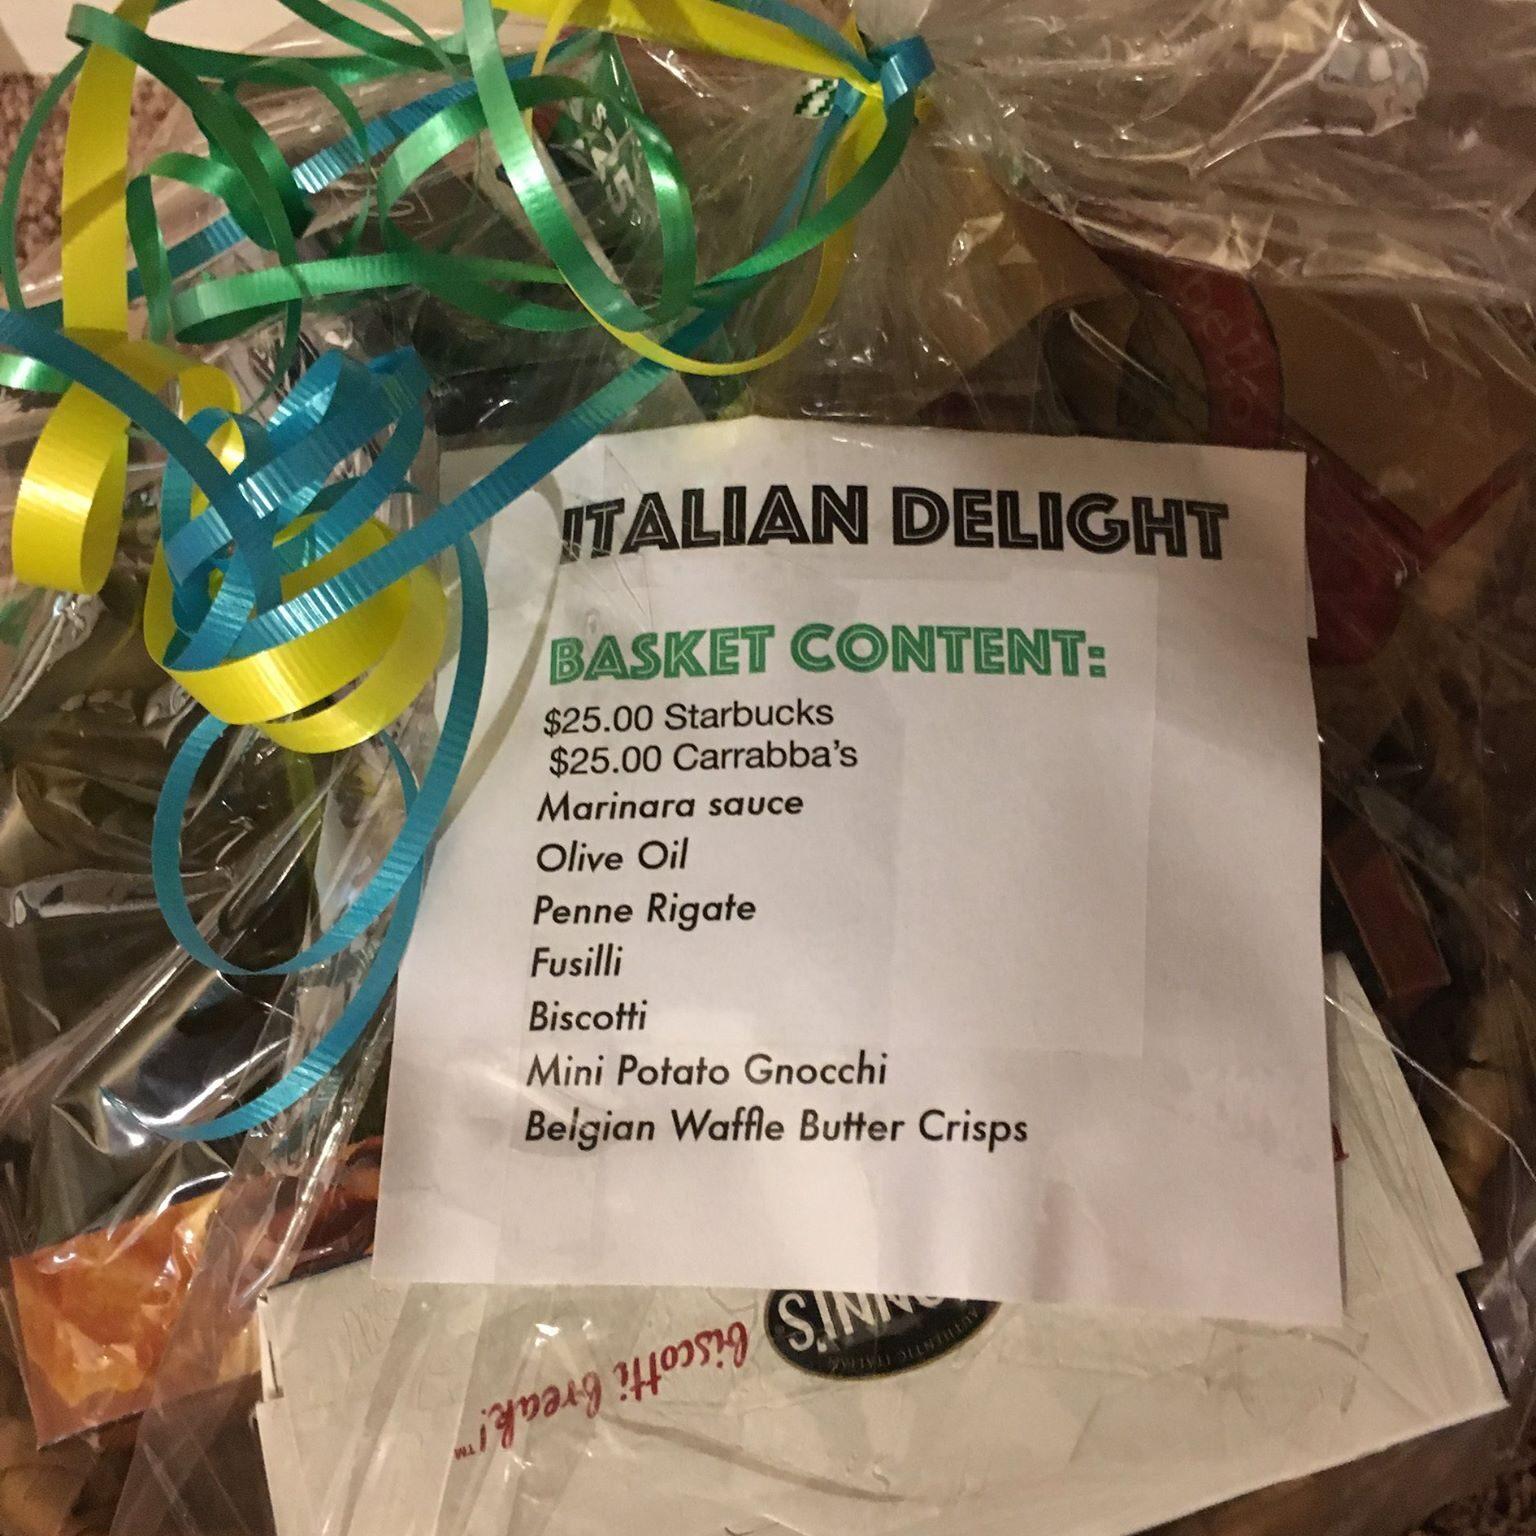 baskset sample italian